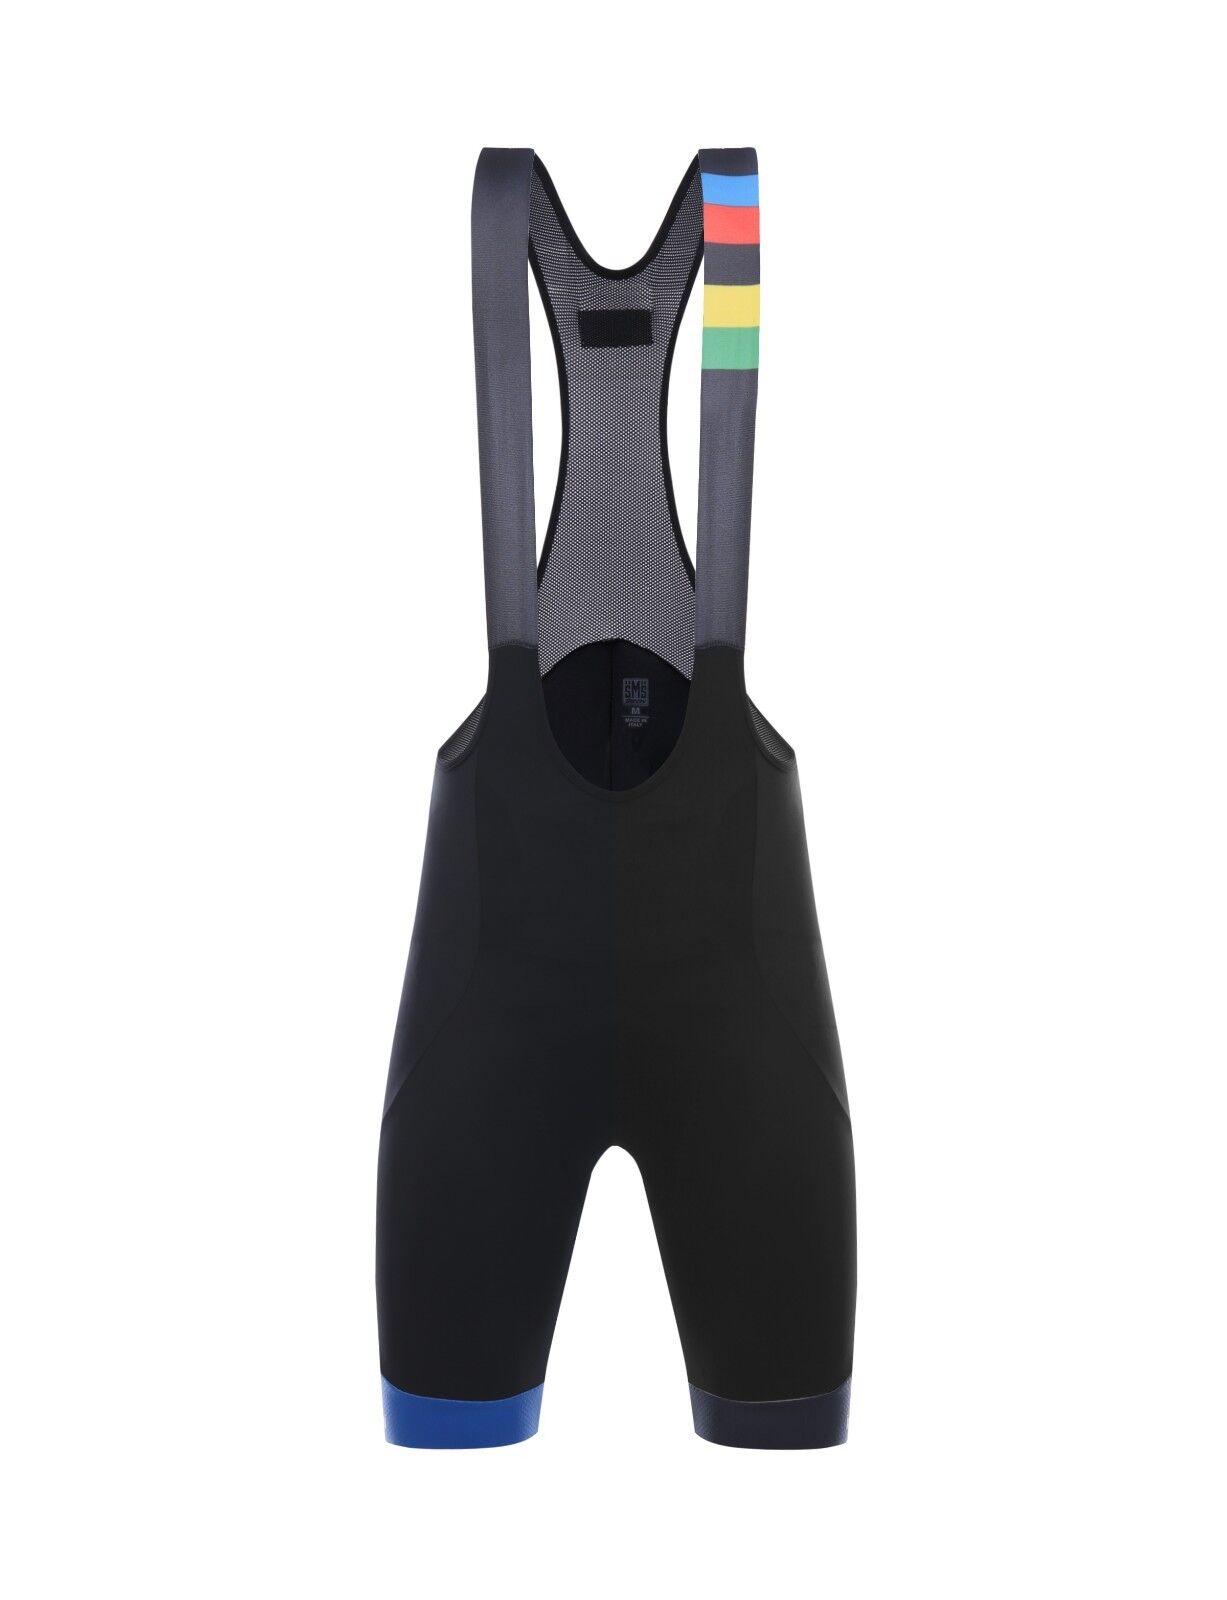 2018 UCI LA DAMA white CYCLING Bib  Shorts - Made in  by Santini  enjoying your shopping